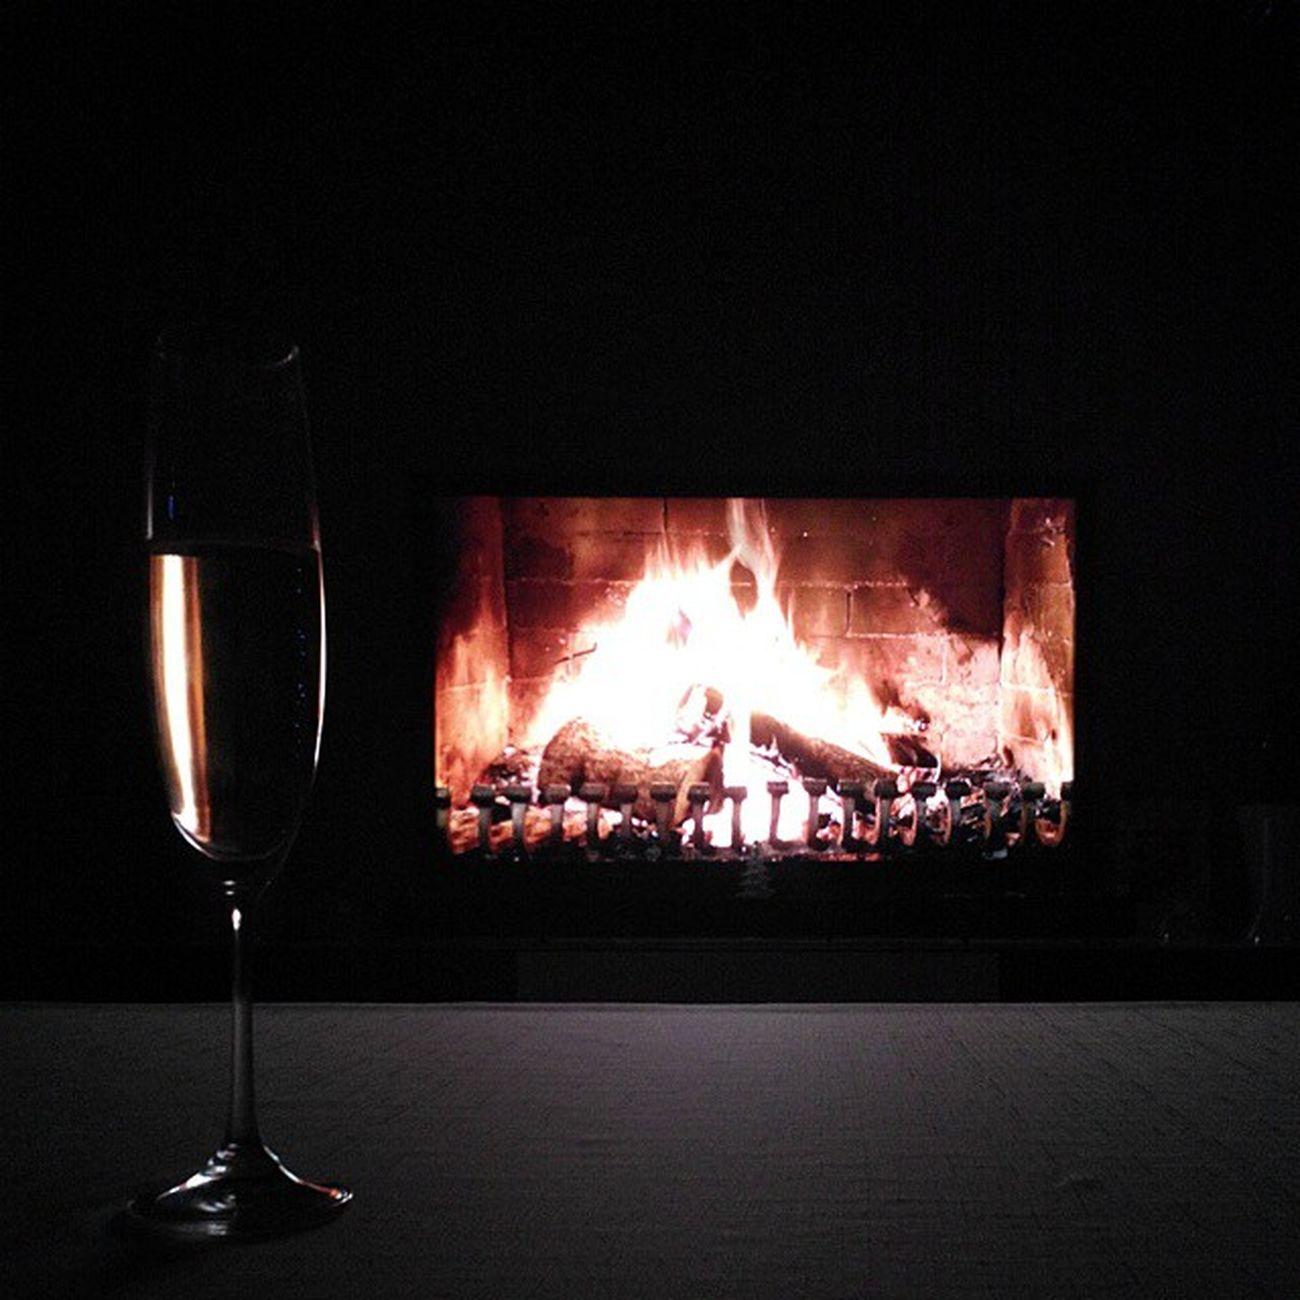 омск сибирь новыйгод рождество шампанское брют абраудюрсо камин Omsk Siberia NewYear Newyearday Christmas Champagne Fireplace Brut